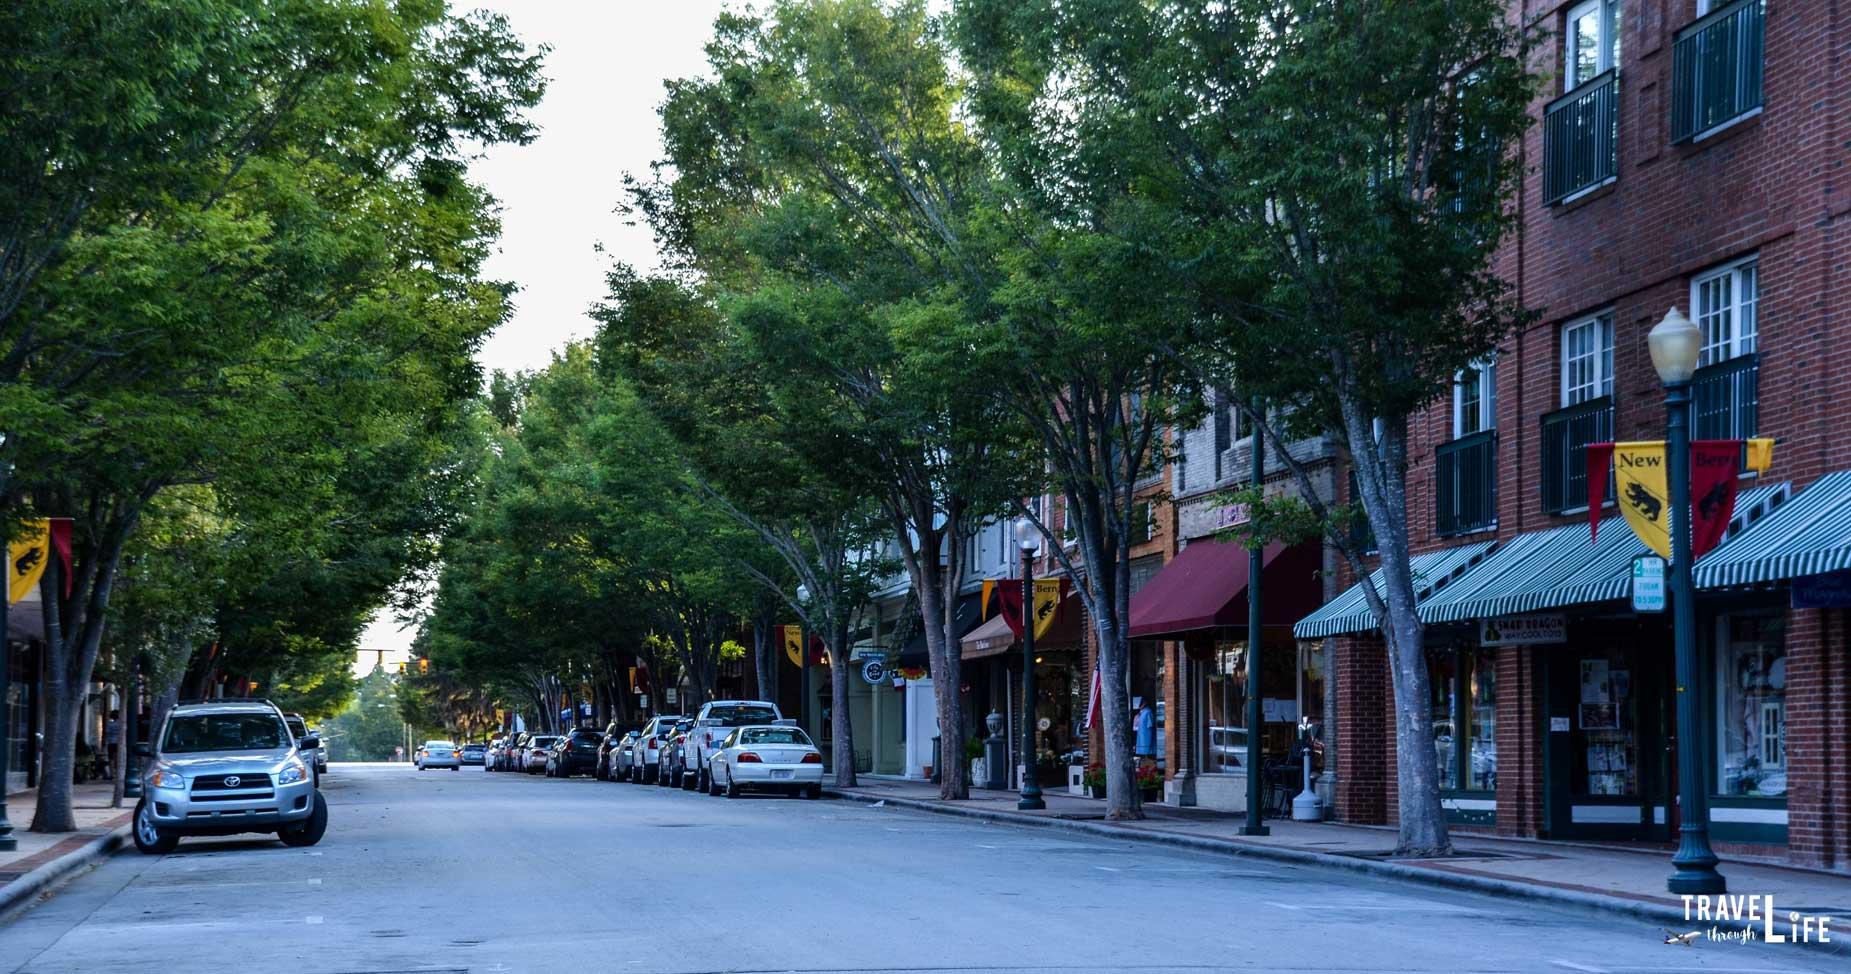 Downtown New Bern North Carolina